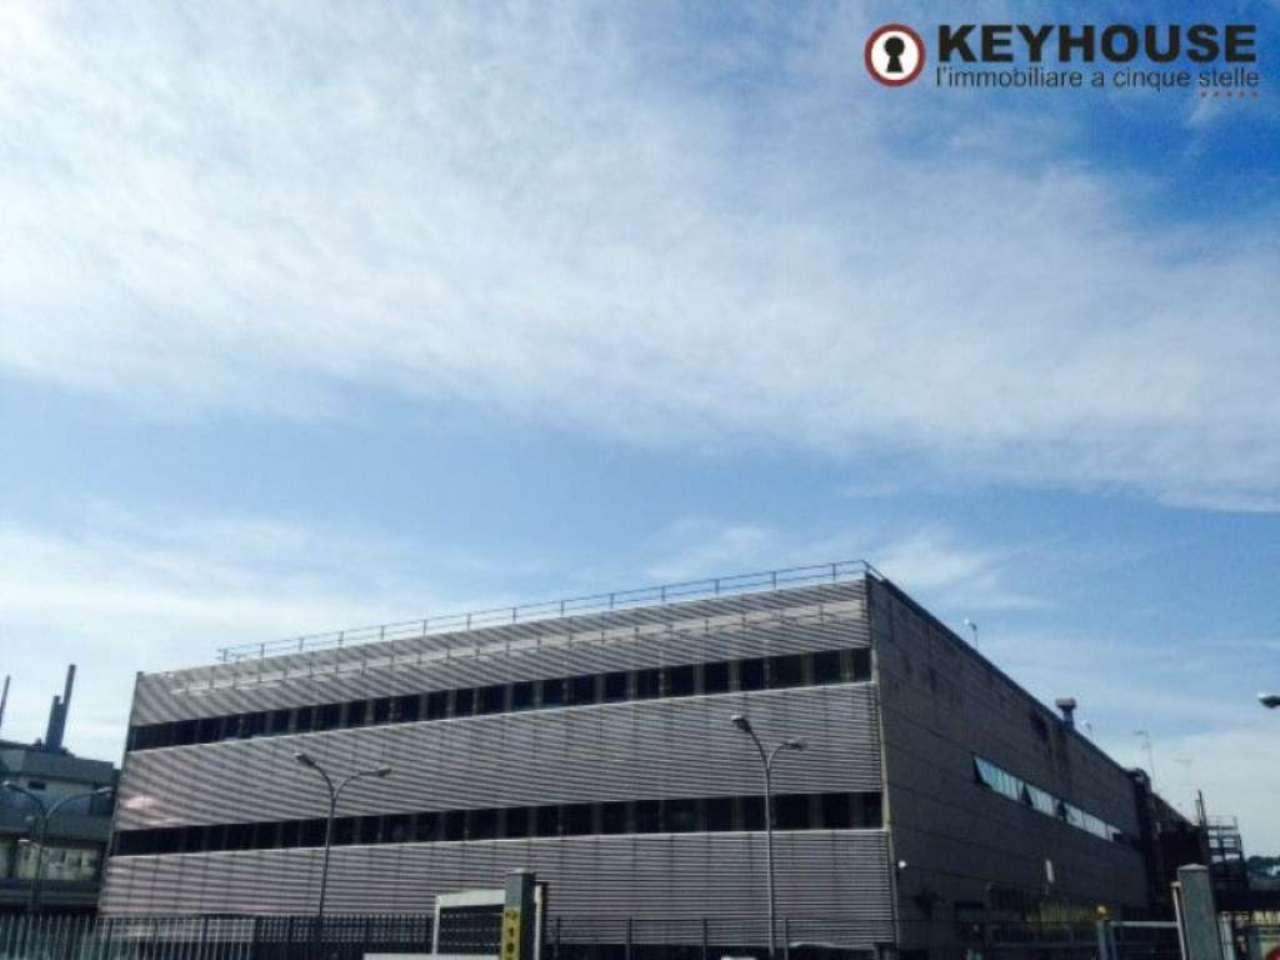 roma affitto quart: settebagni keyhouse-immobiliare-srl